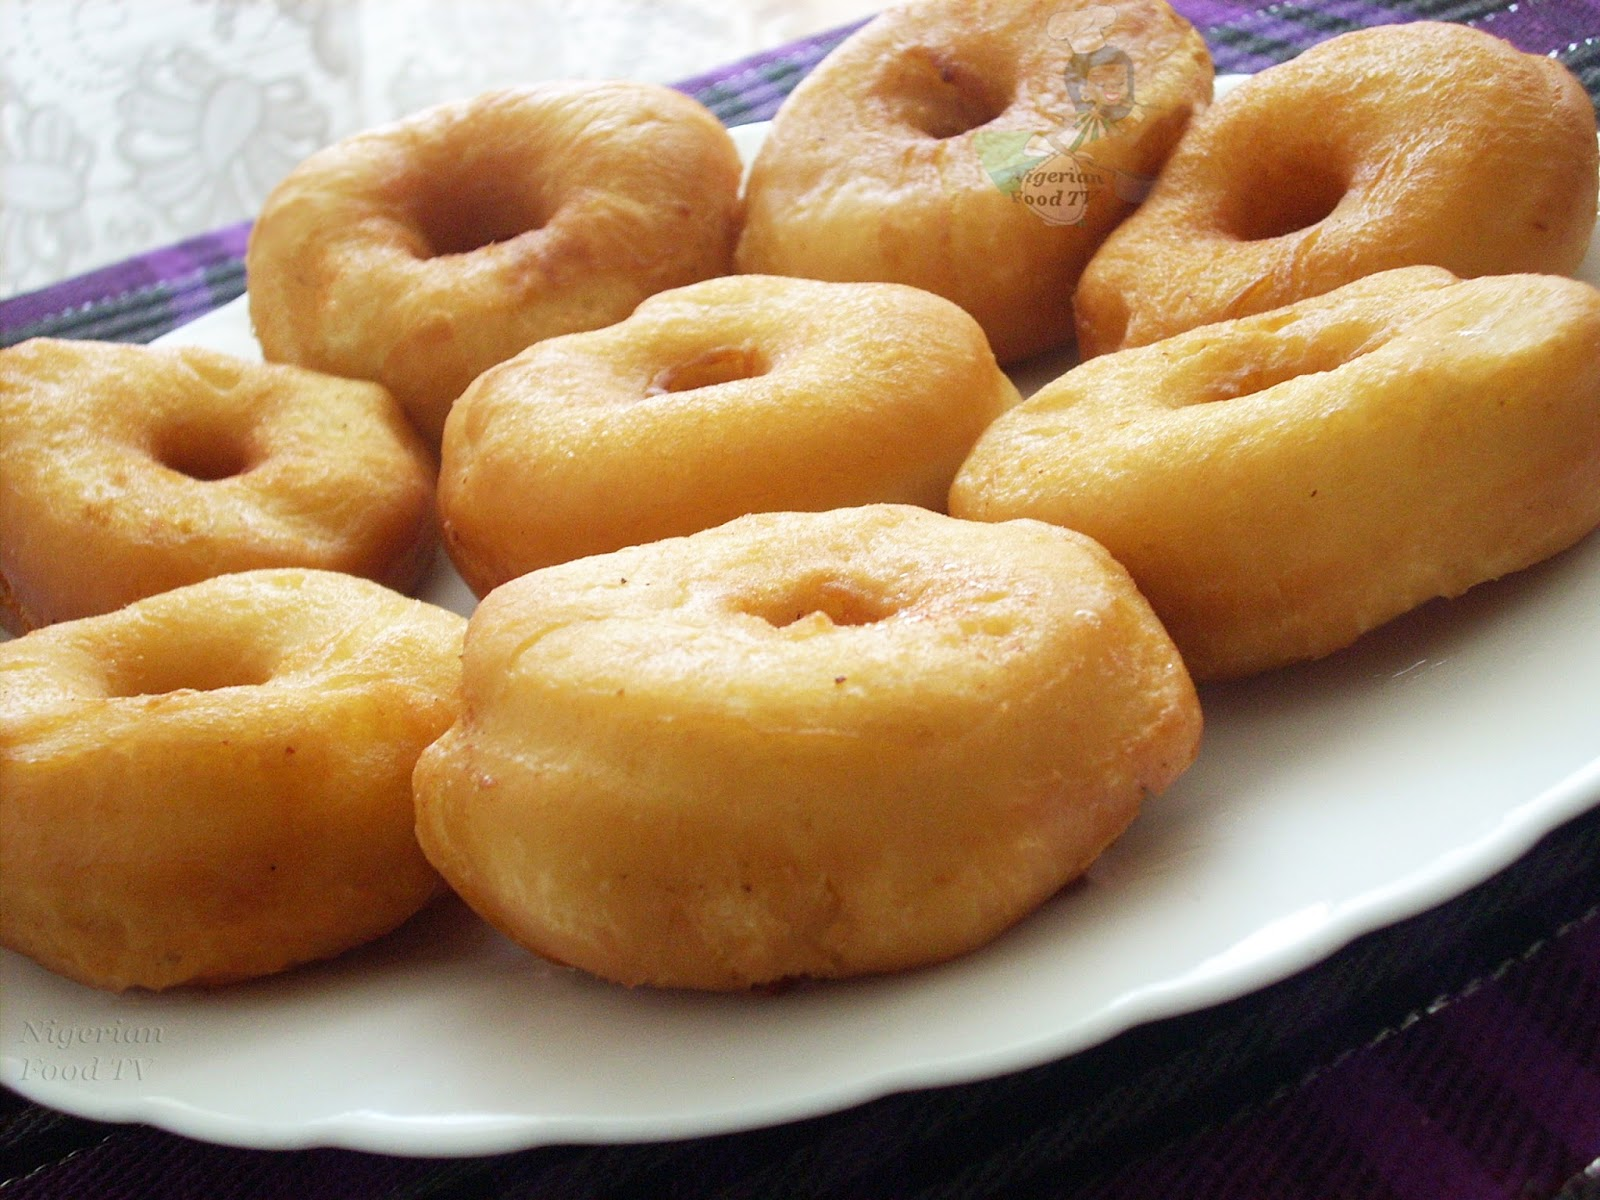 How to make nigerian donuts nigerian doughnuts filled with jam how to make nigerian donuts nigerian donuts nigerian doughnuts forumfinder Images